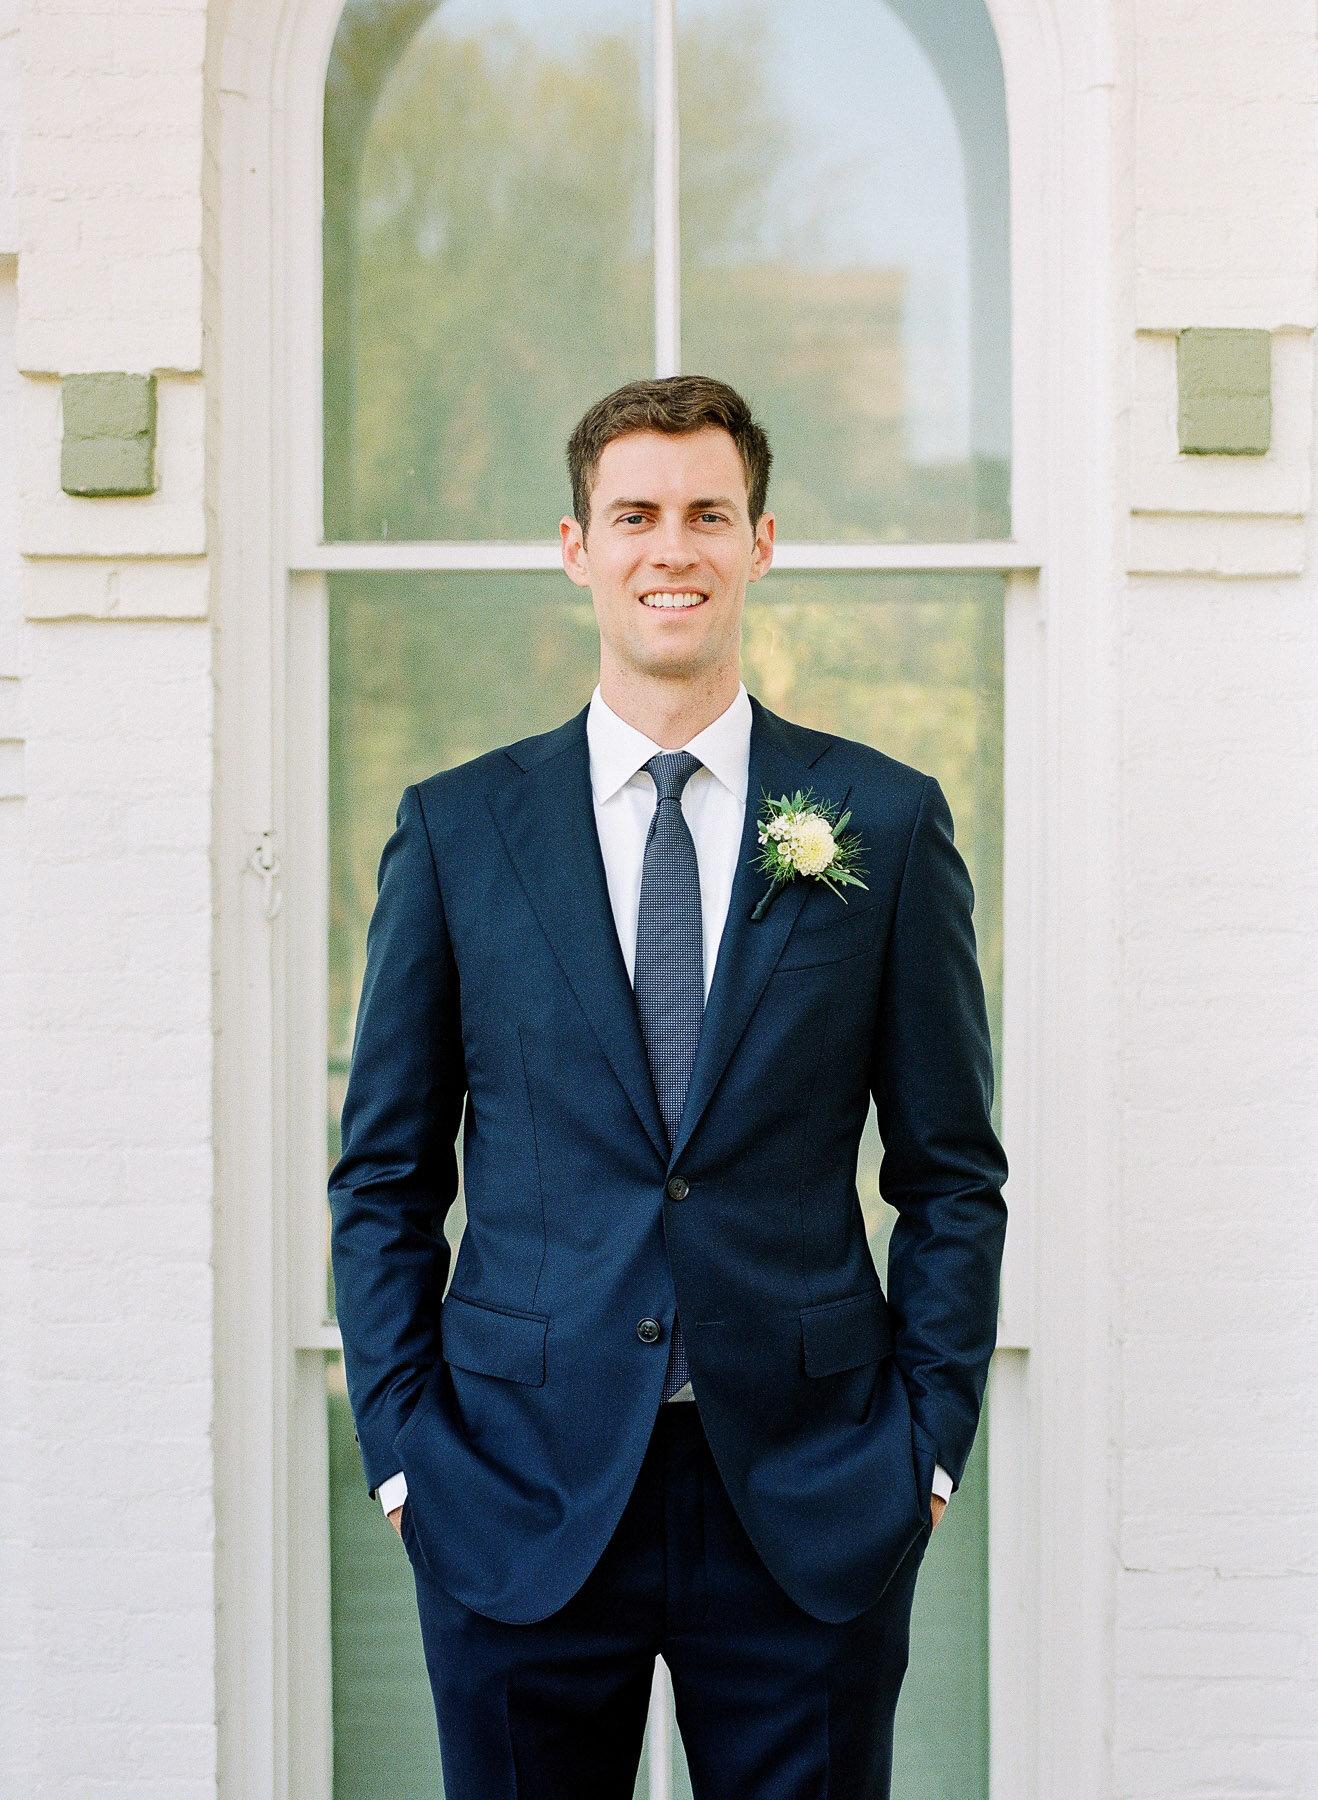 Adelphi Saratoga Wedding by Michelle Lange Photography-20.jpg